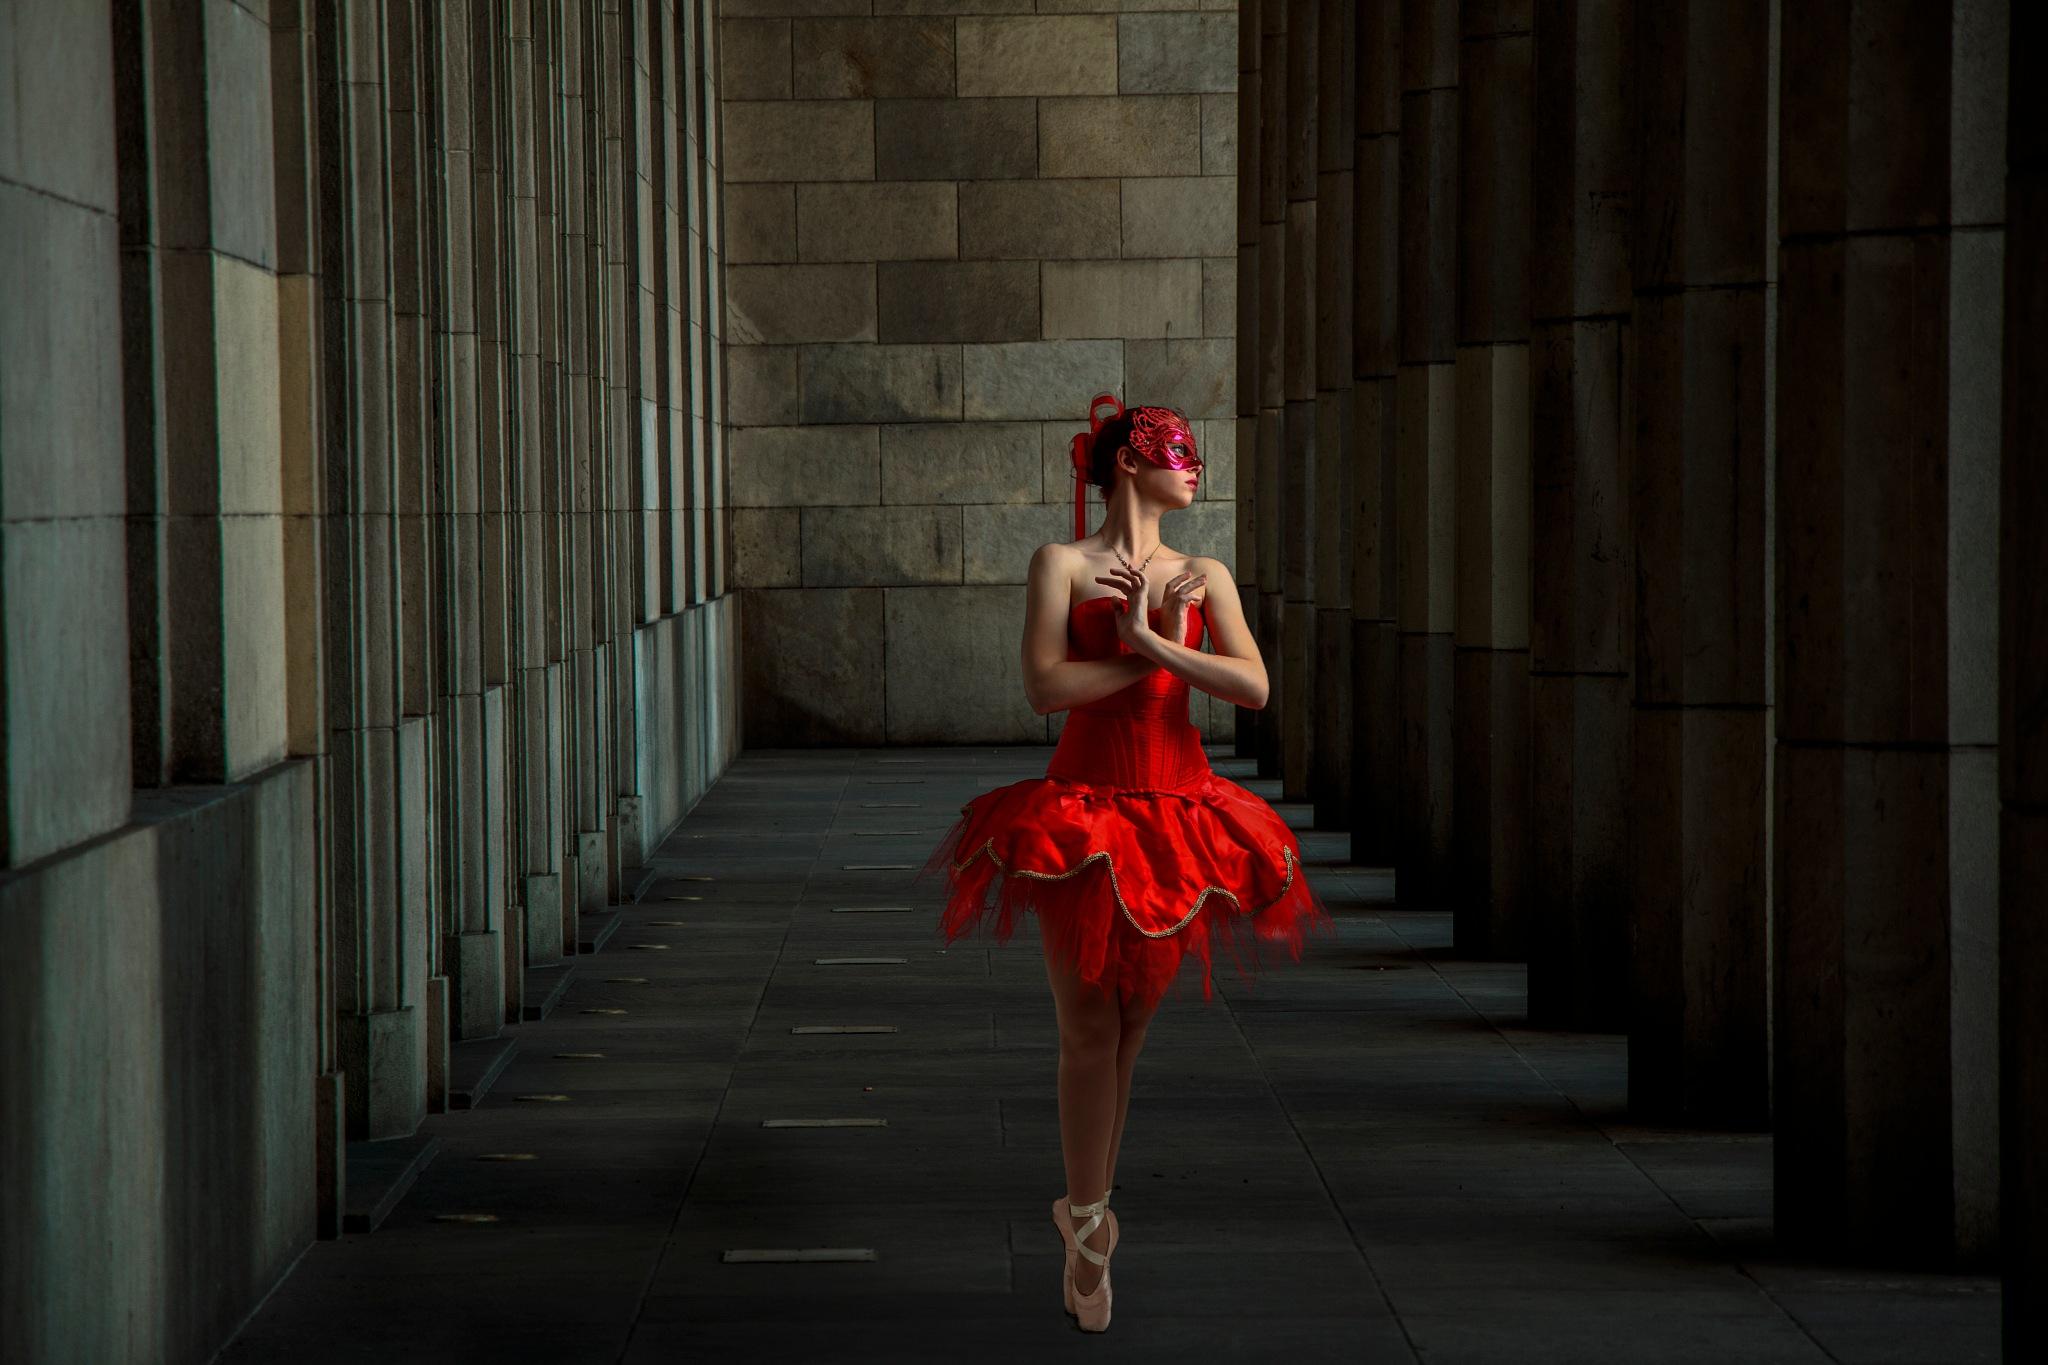 dancing by Wilfried Schulze